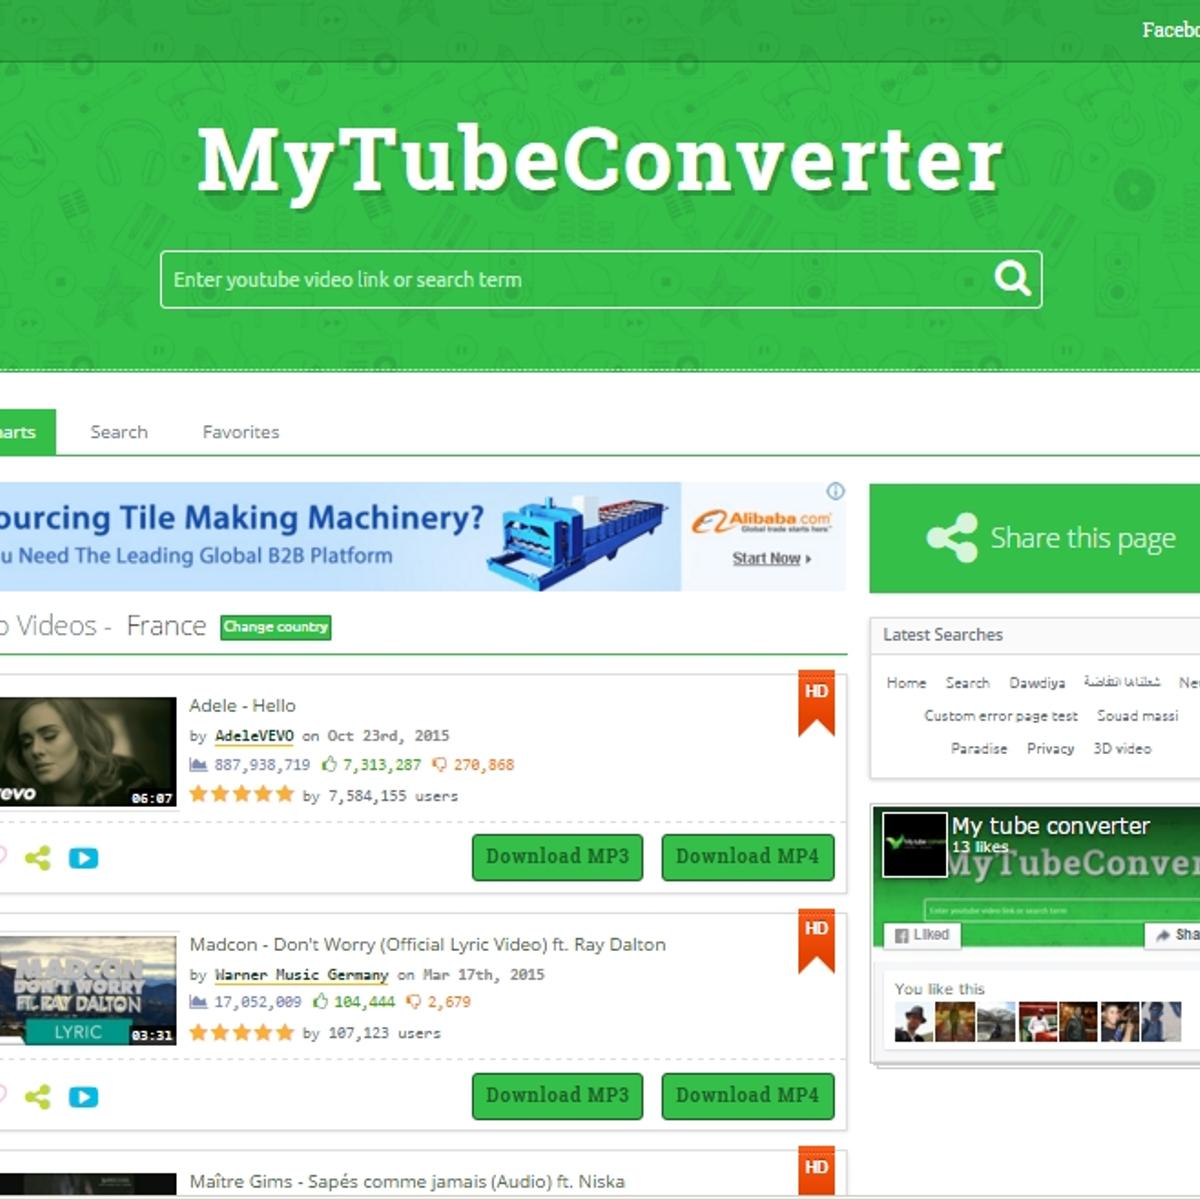 MyTubeConverter Alternatives and Similar Websites and Apps